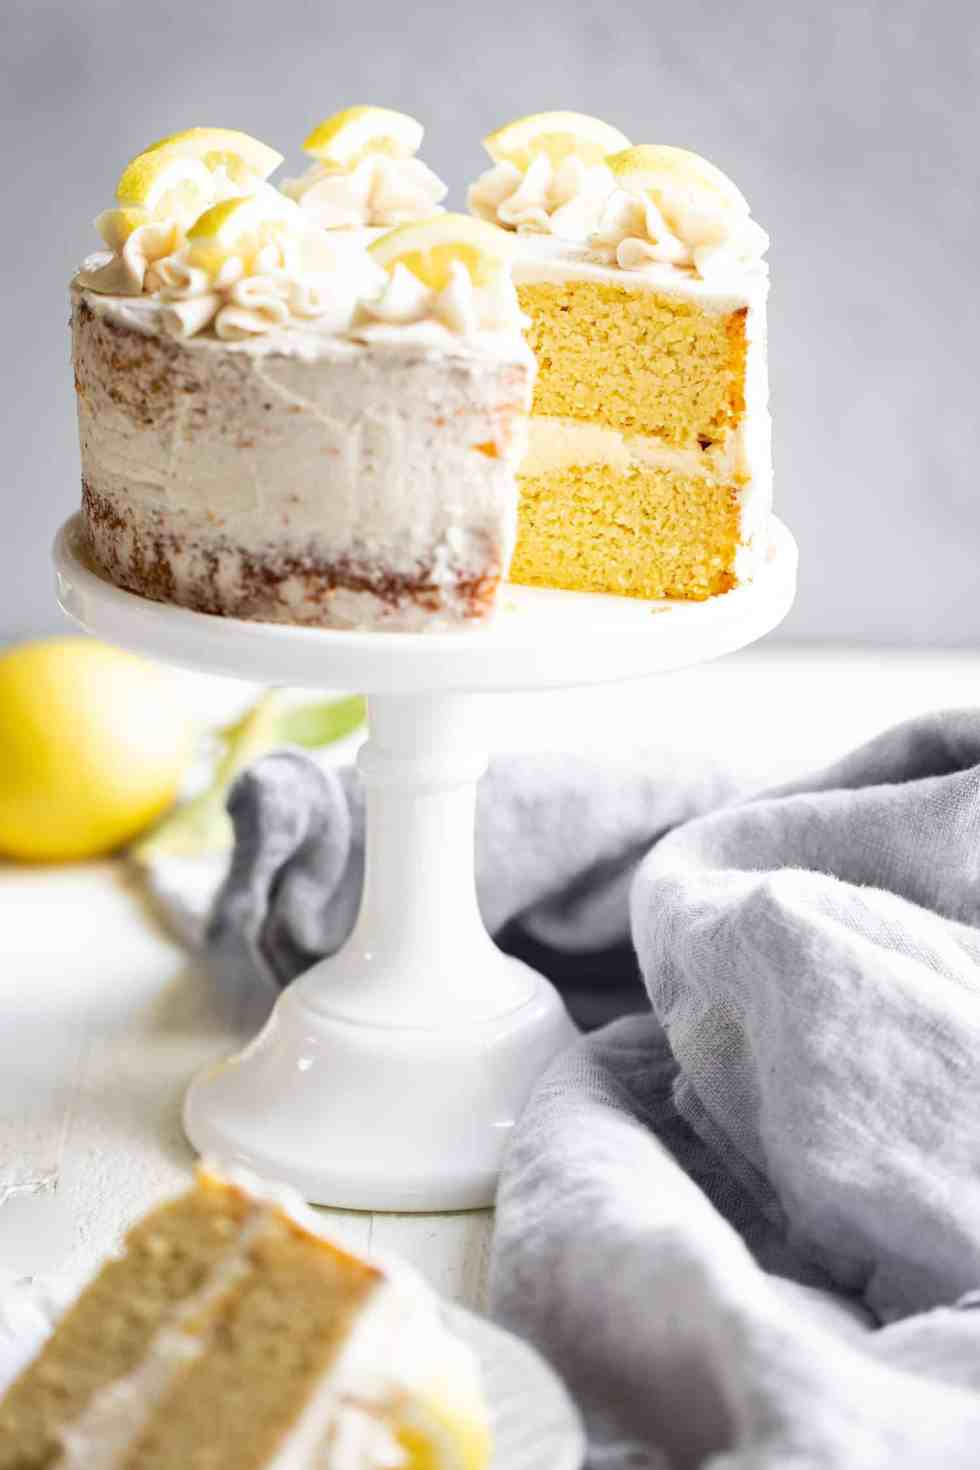 sugar free lemon cake on a cake stand